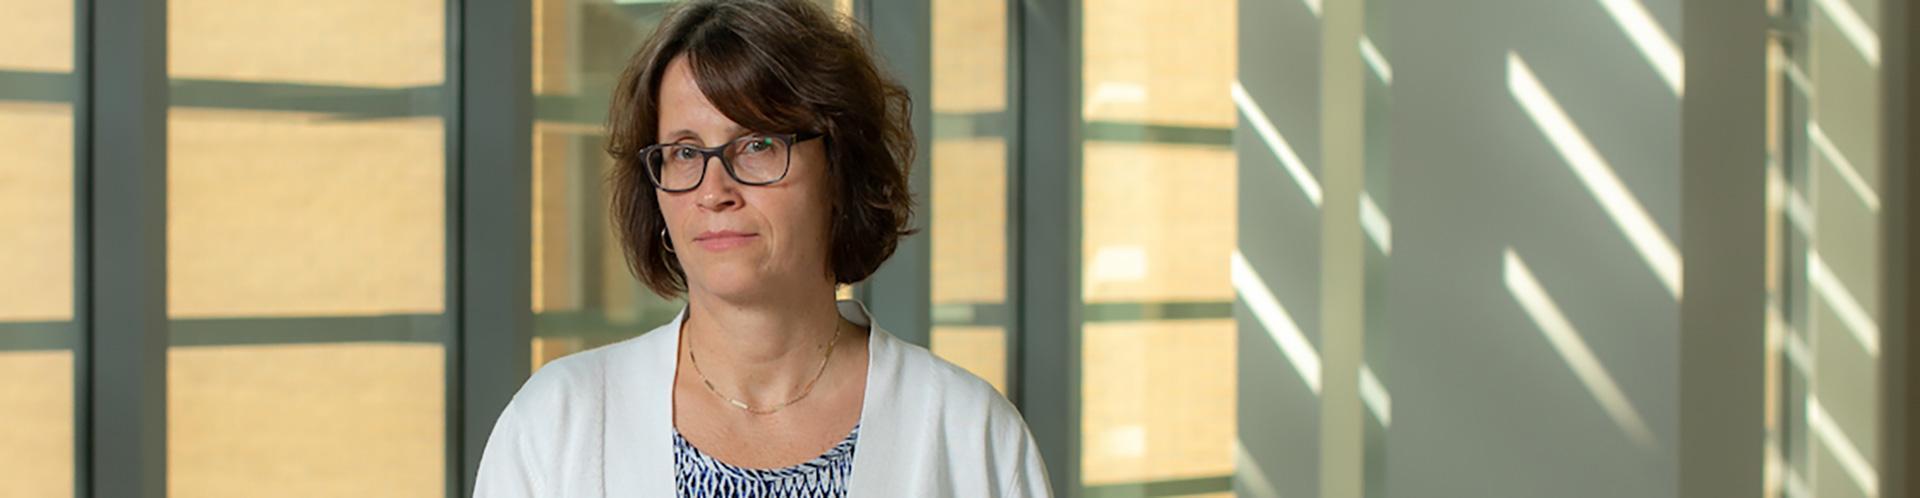 Martina Kaledin receives NSF grant for computational chemistry